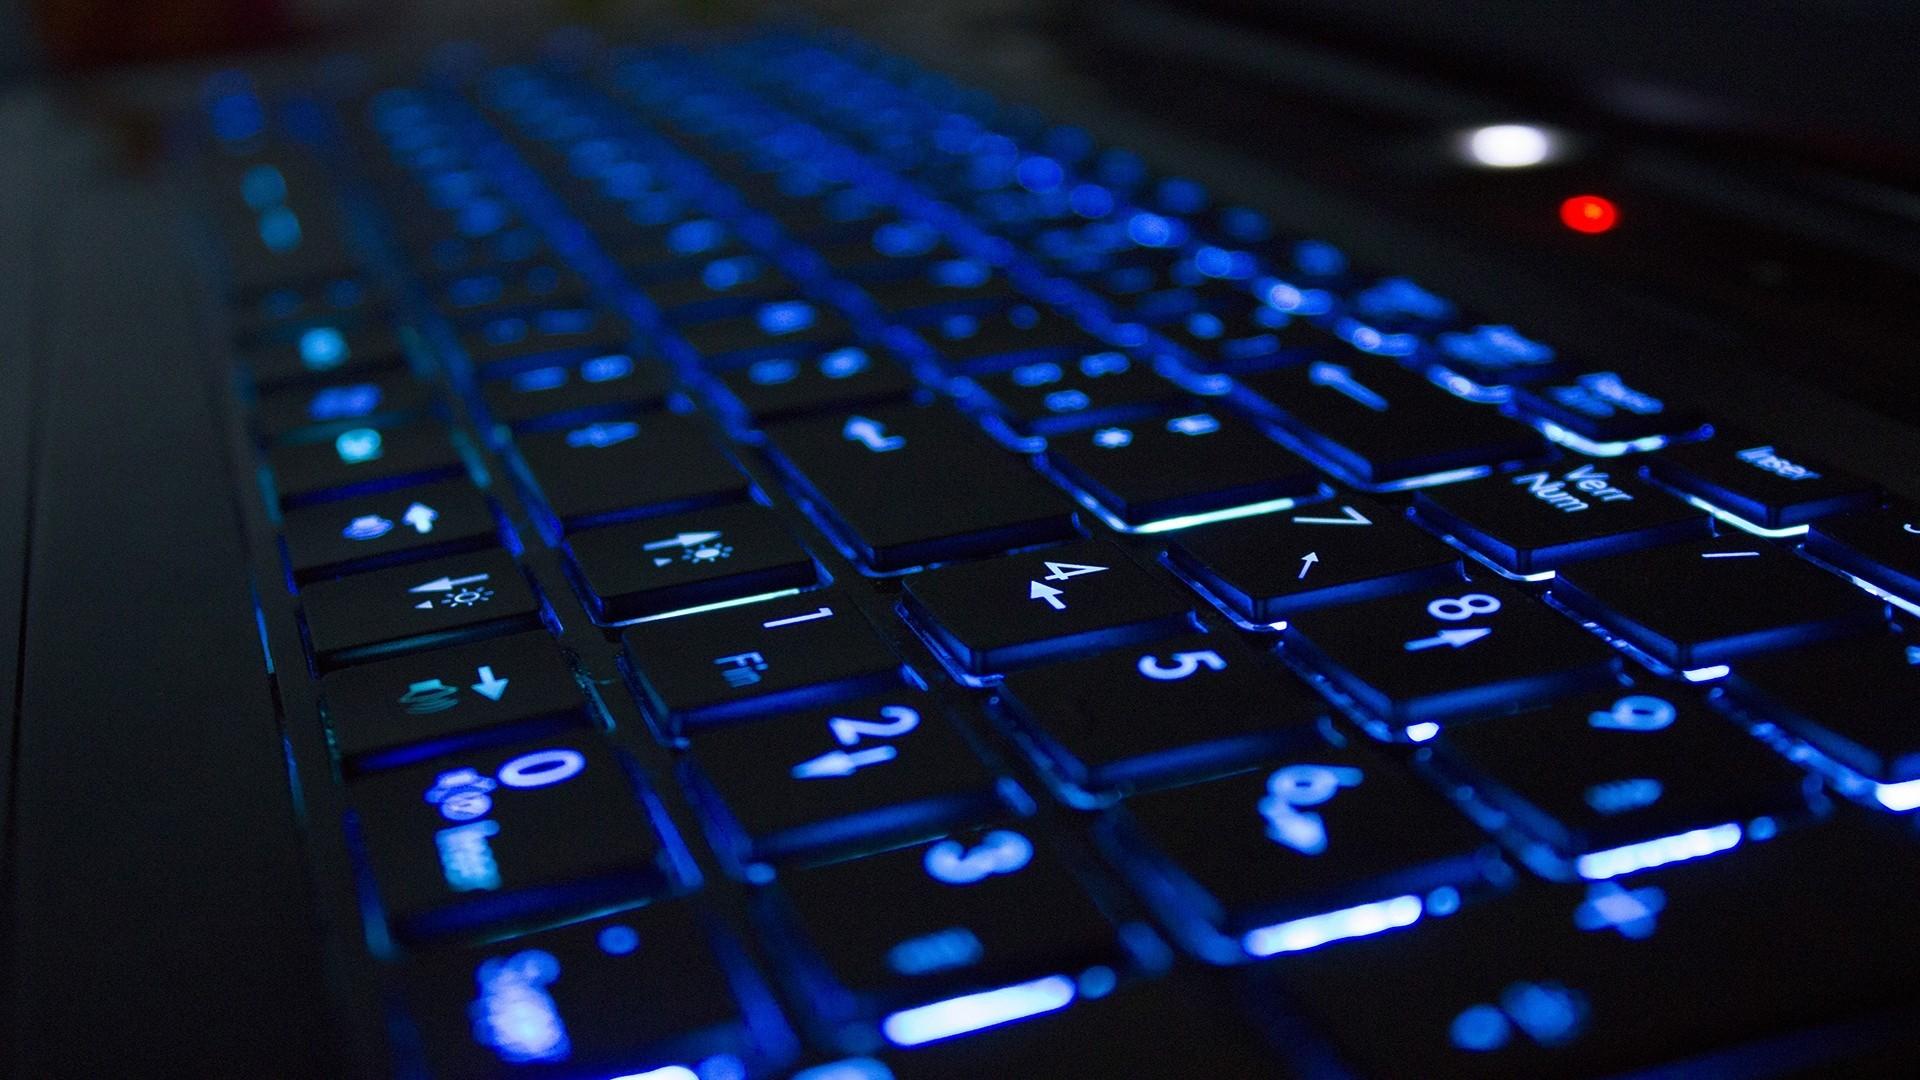 Keyboard Hi-Tech